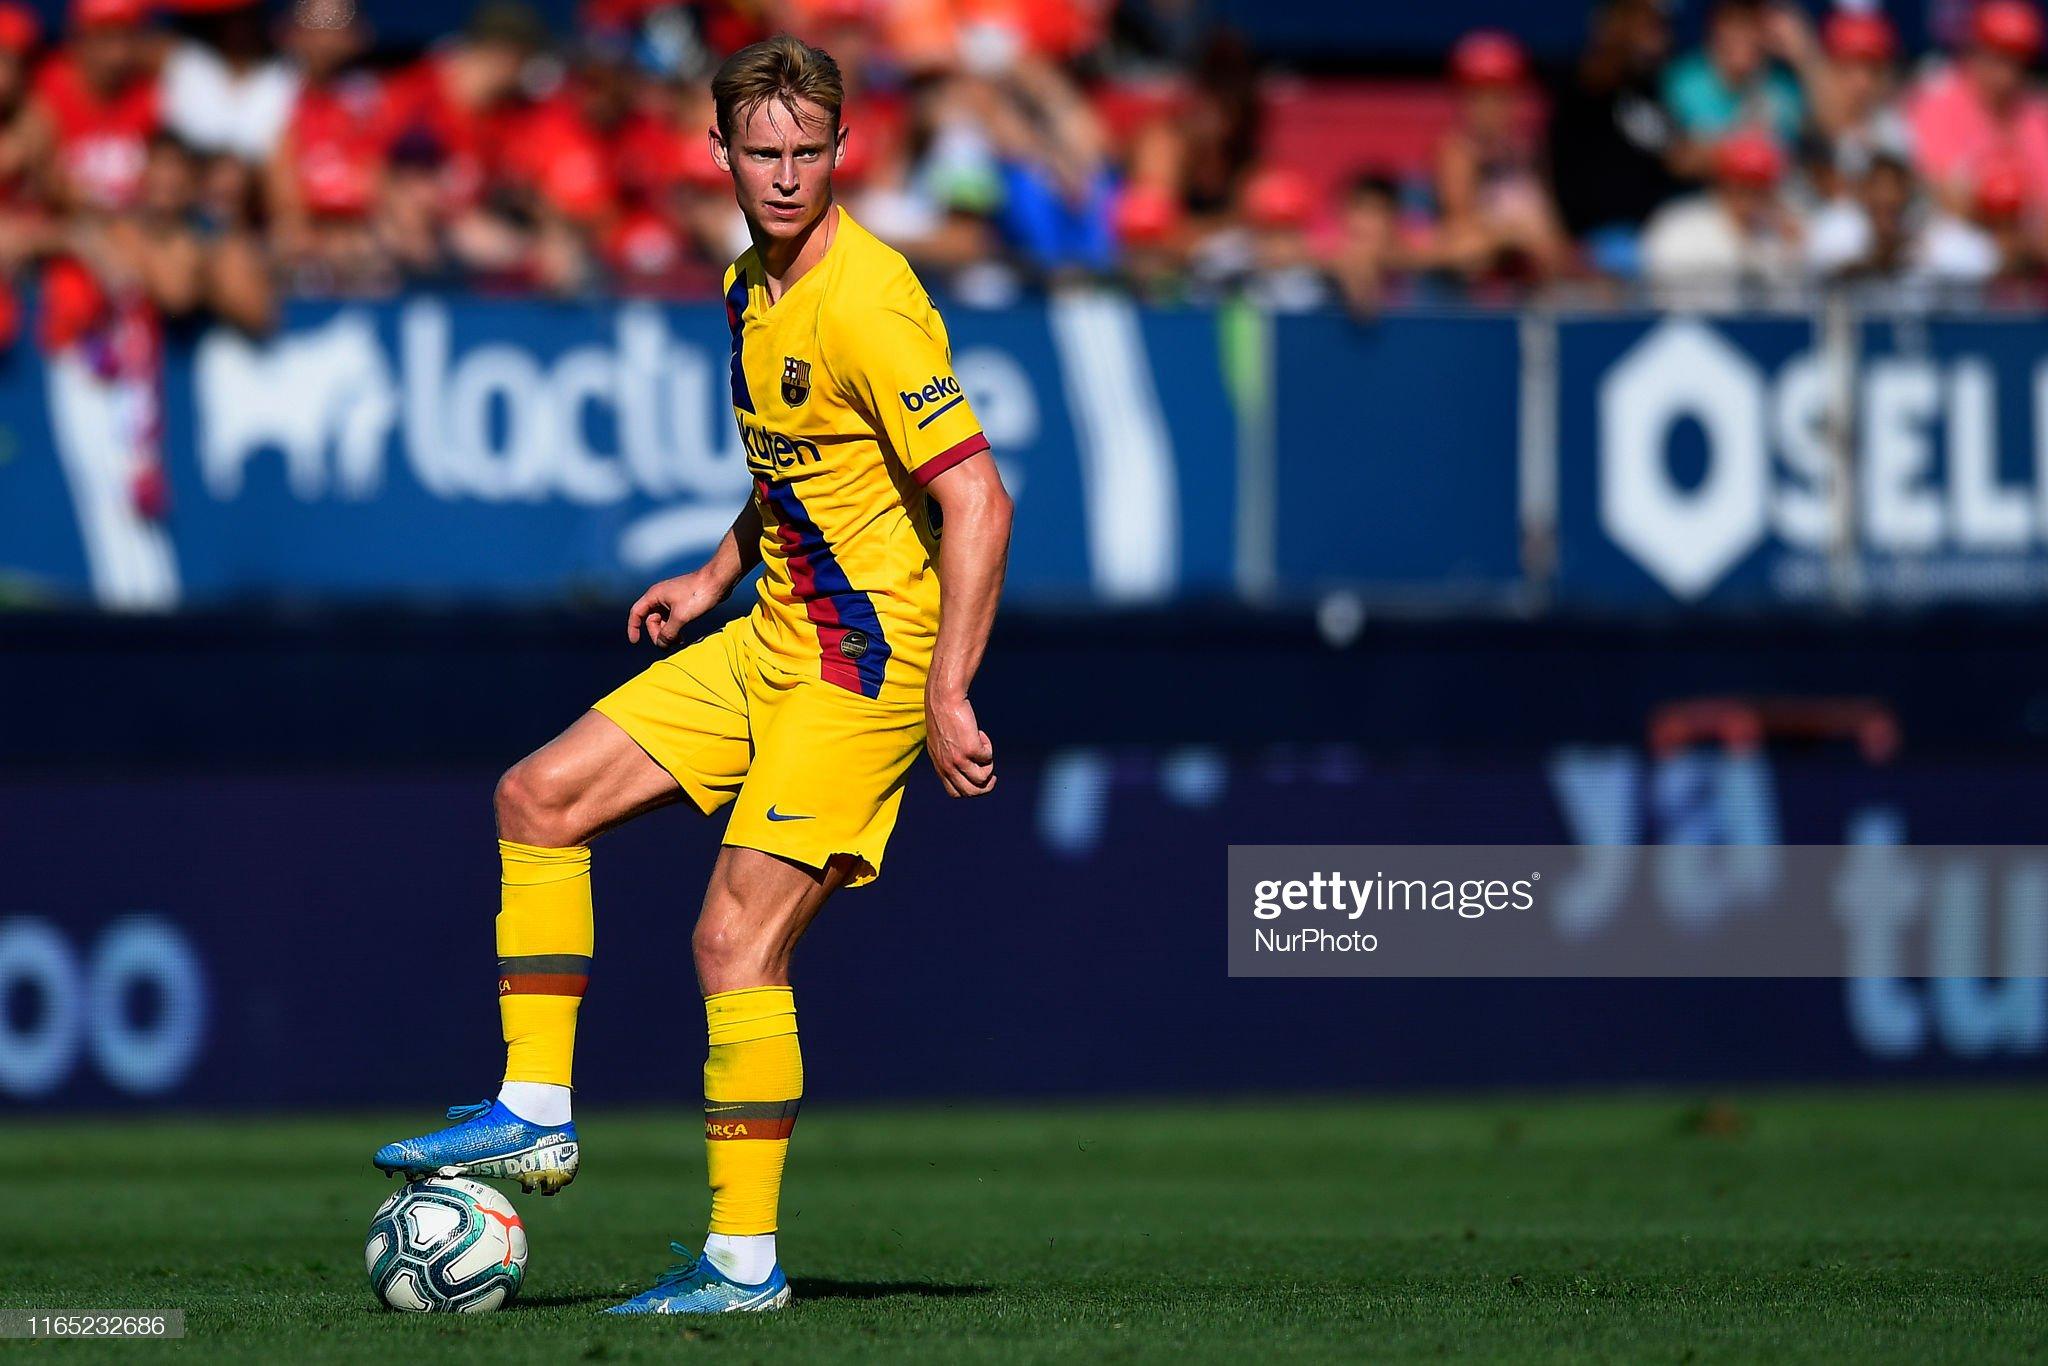 صور مباراة : أوساسونا - برشلونة 2-2 ( 31-08-2019 )  Frenkie-de-jong-of-barcelona-controls-the-ball-during-the-liga-match-picture-id1165232686?s=2048x2048